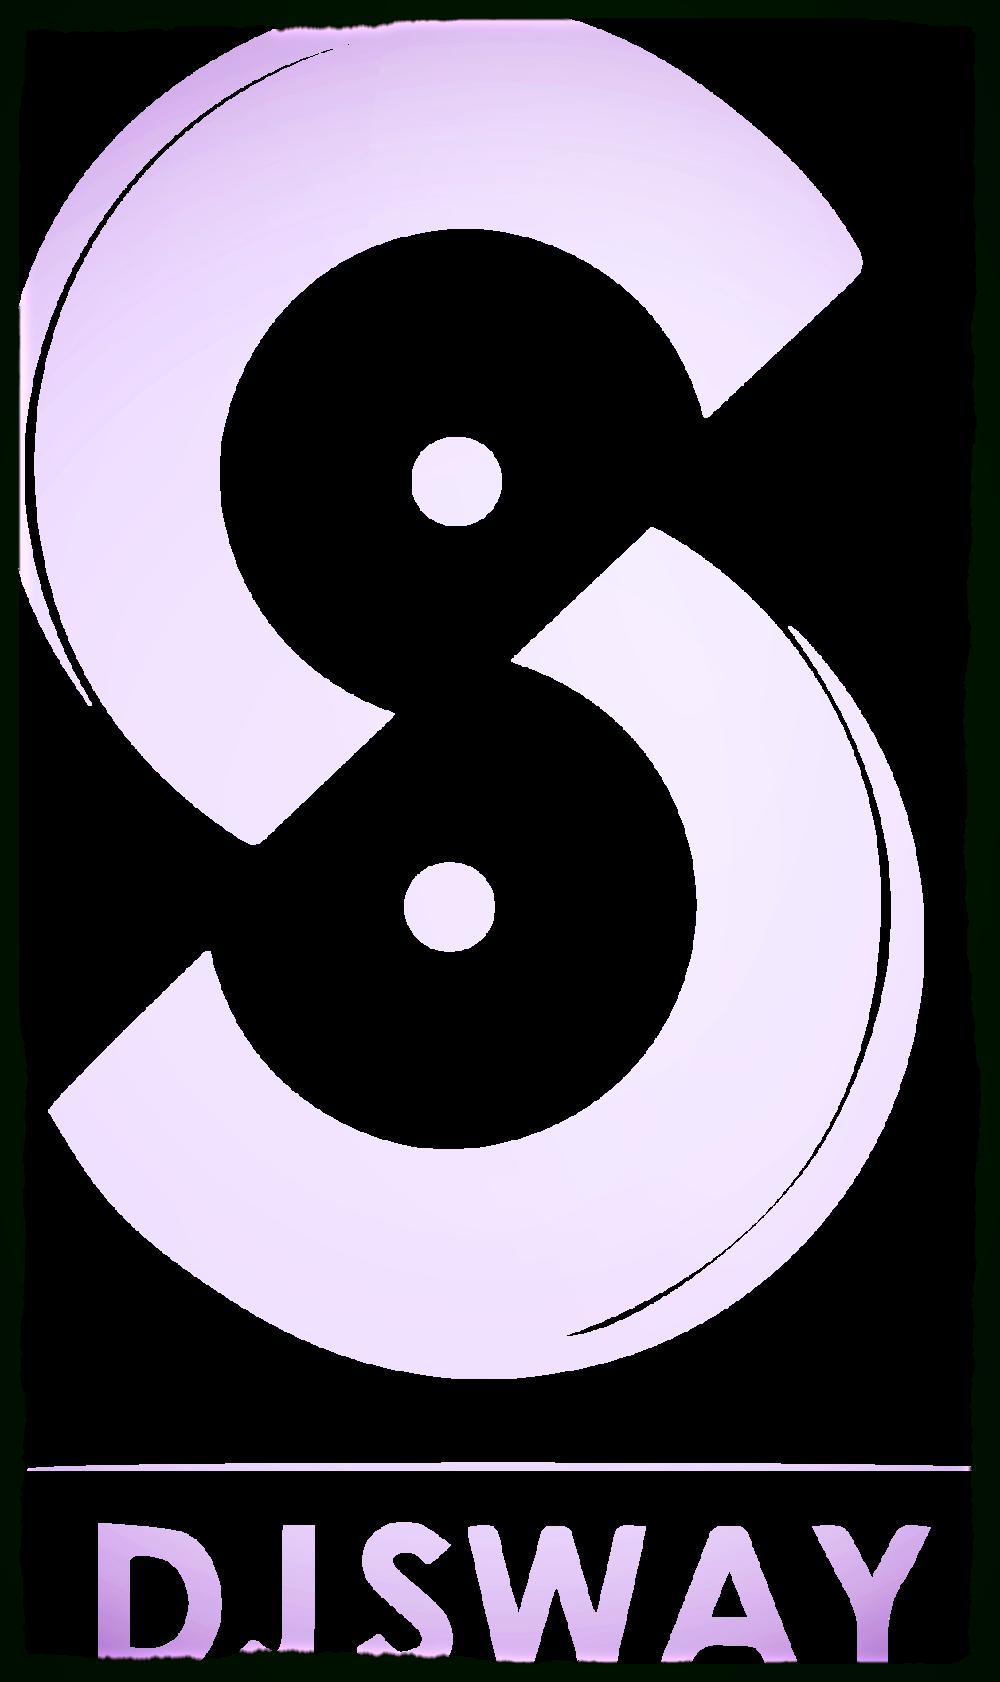 DJ_Sway_logo.png